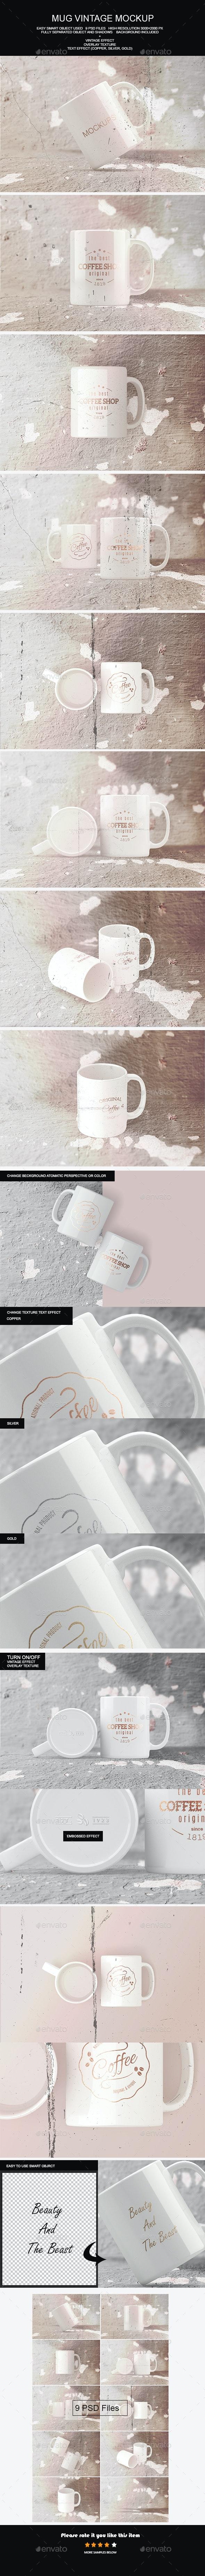 Mug Vintage Mock-Up - Product Mock-Ups Graphics